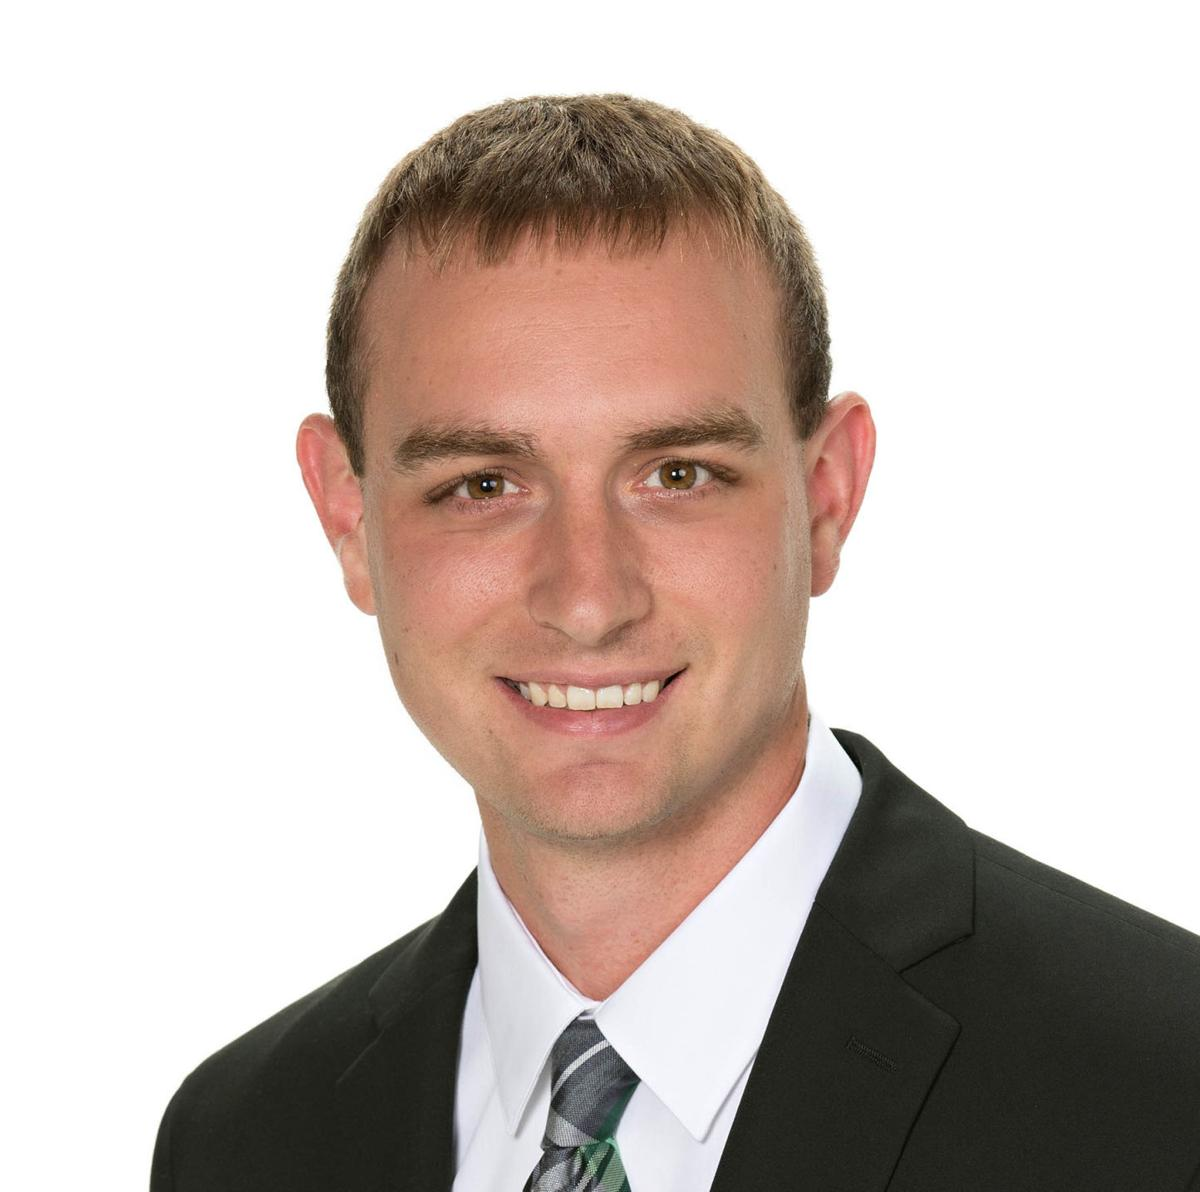 Cody Heckenlaible